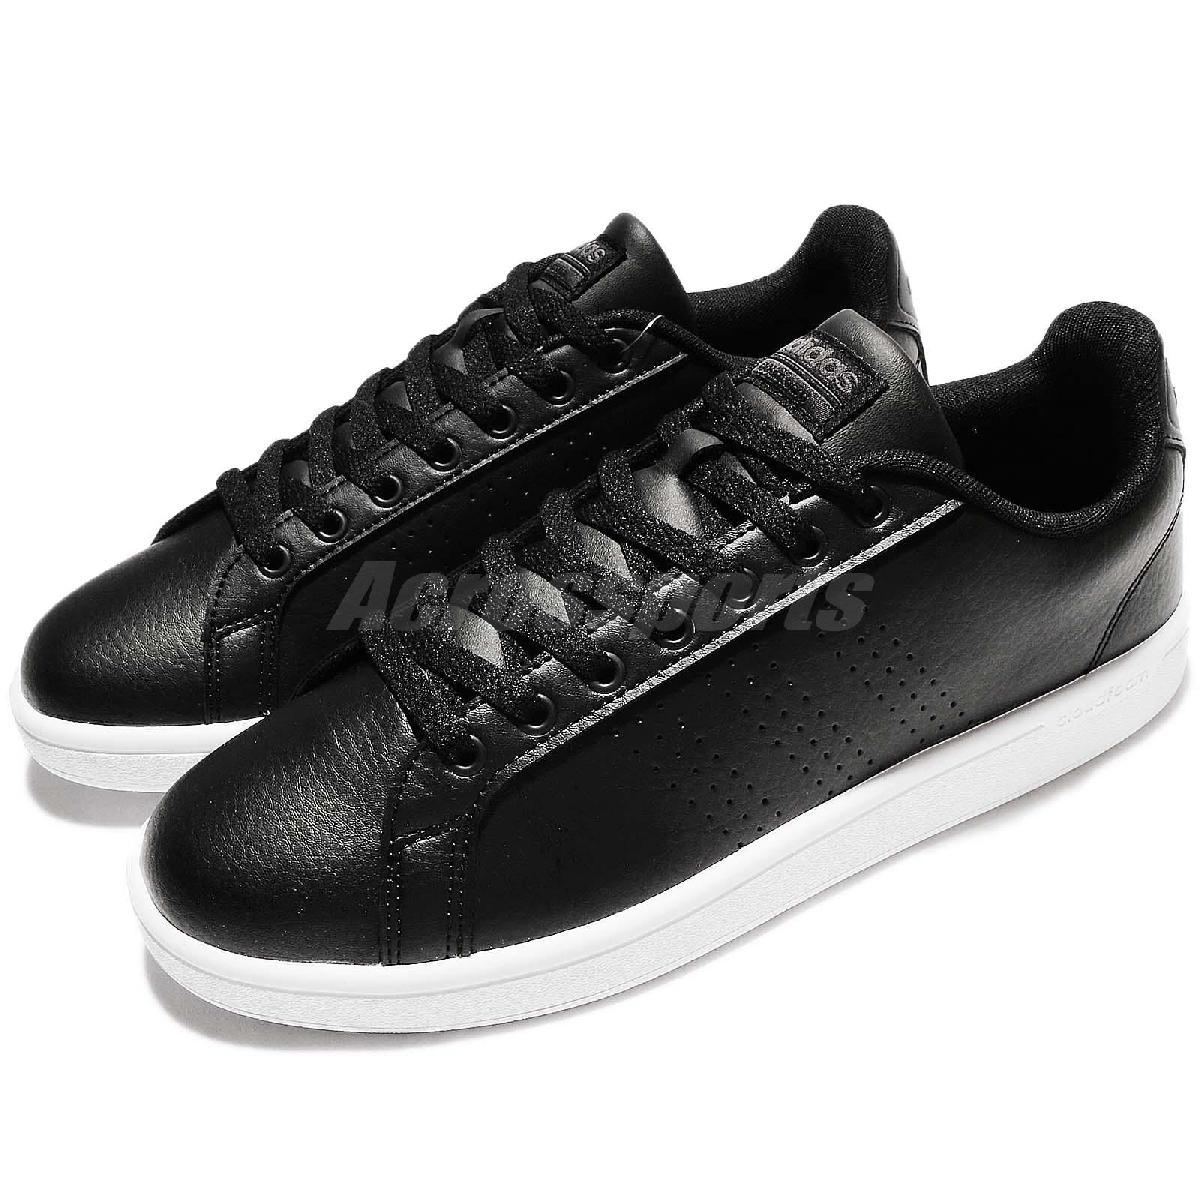 adidas 休閒鞋 Cloudfoam Advantage Clean 黑 白 皮革 百搭 黑白 基本款 男鞋【PUMP306】 AW3915